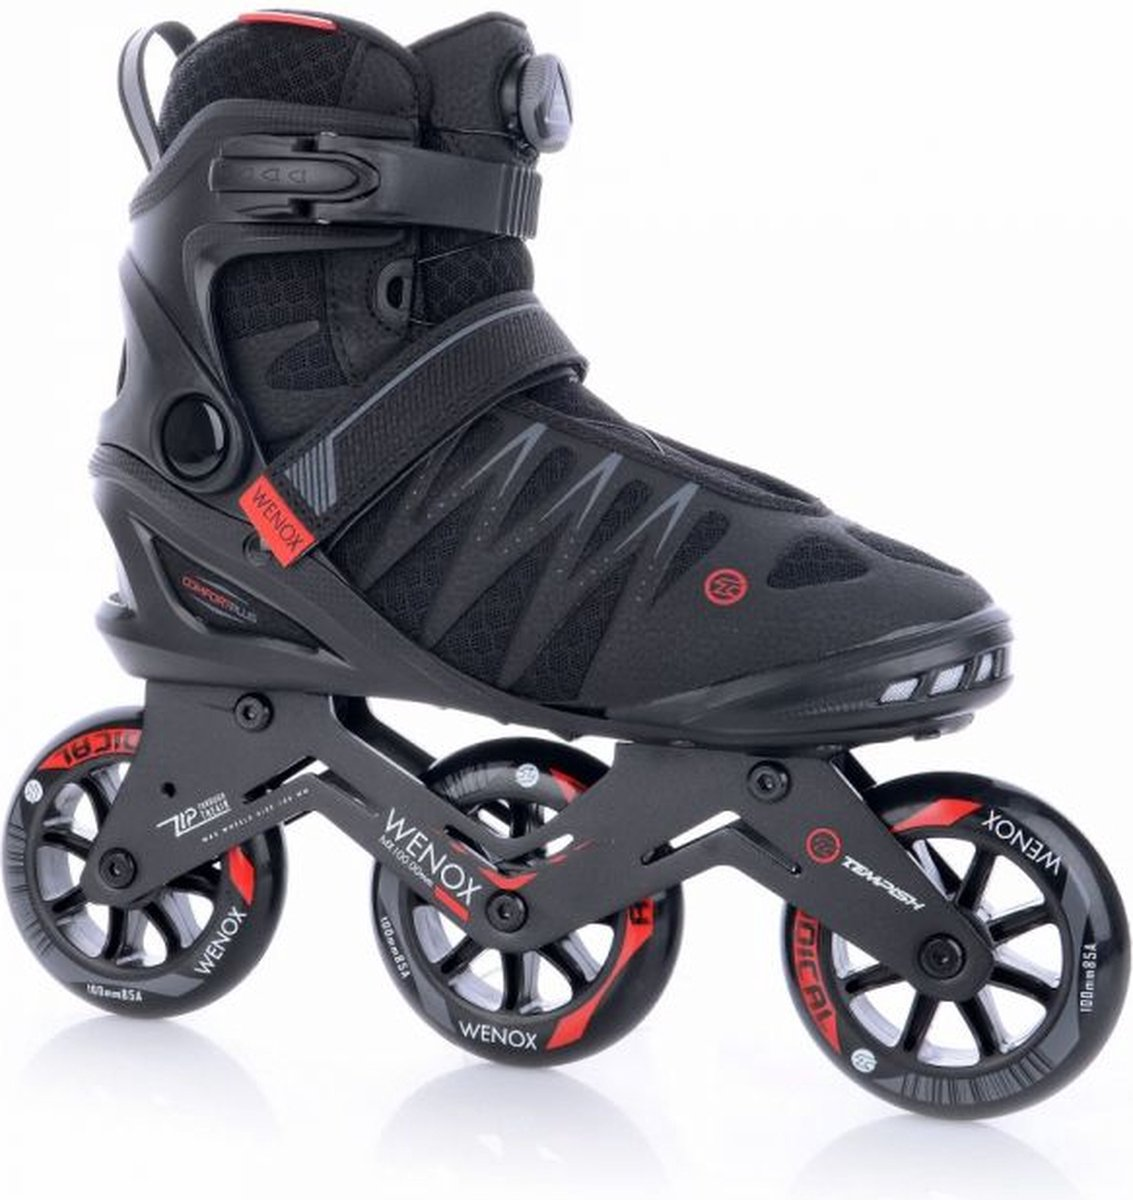 Tempish - Skeelers - Wenox - Top 100 - Zwart/Rood - Maat 42 - Heren - Skates